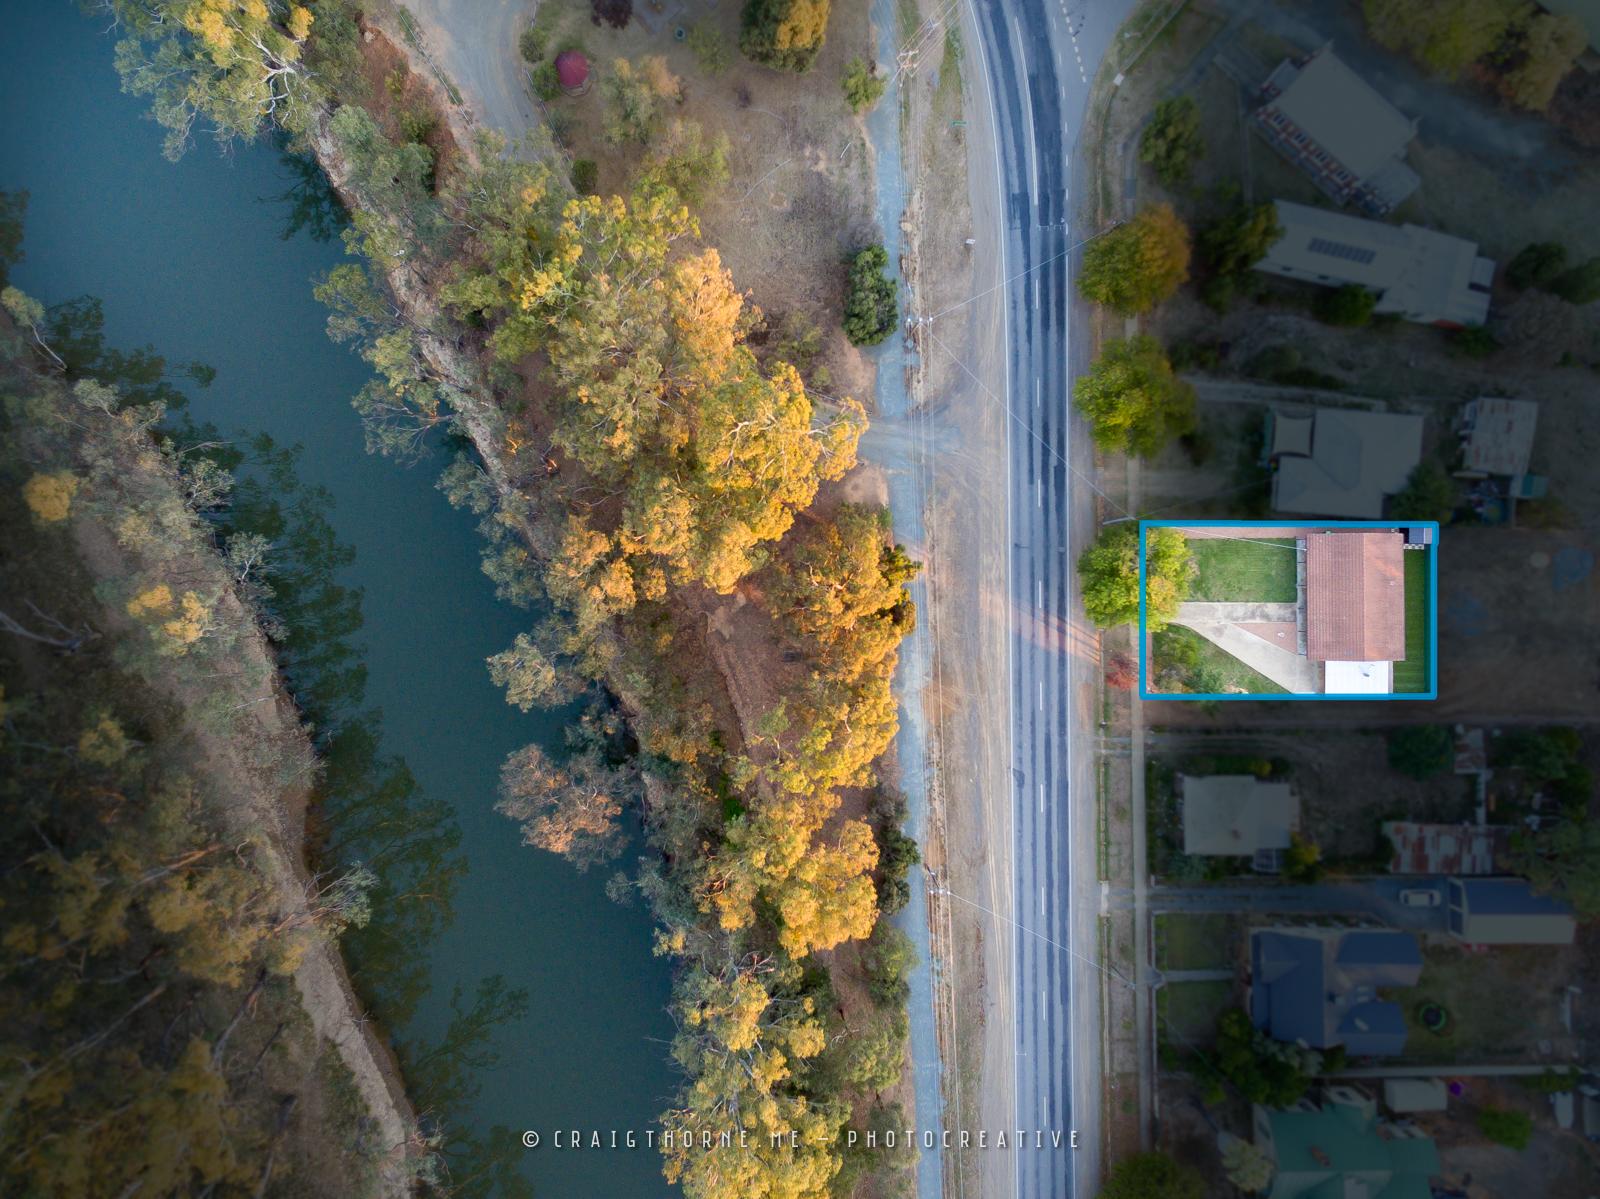 20180419-04-6-River-Rd-Murchison-©CT-THN_0402-SkyView.jpg